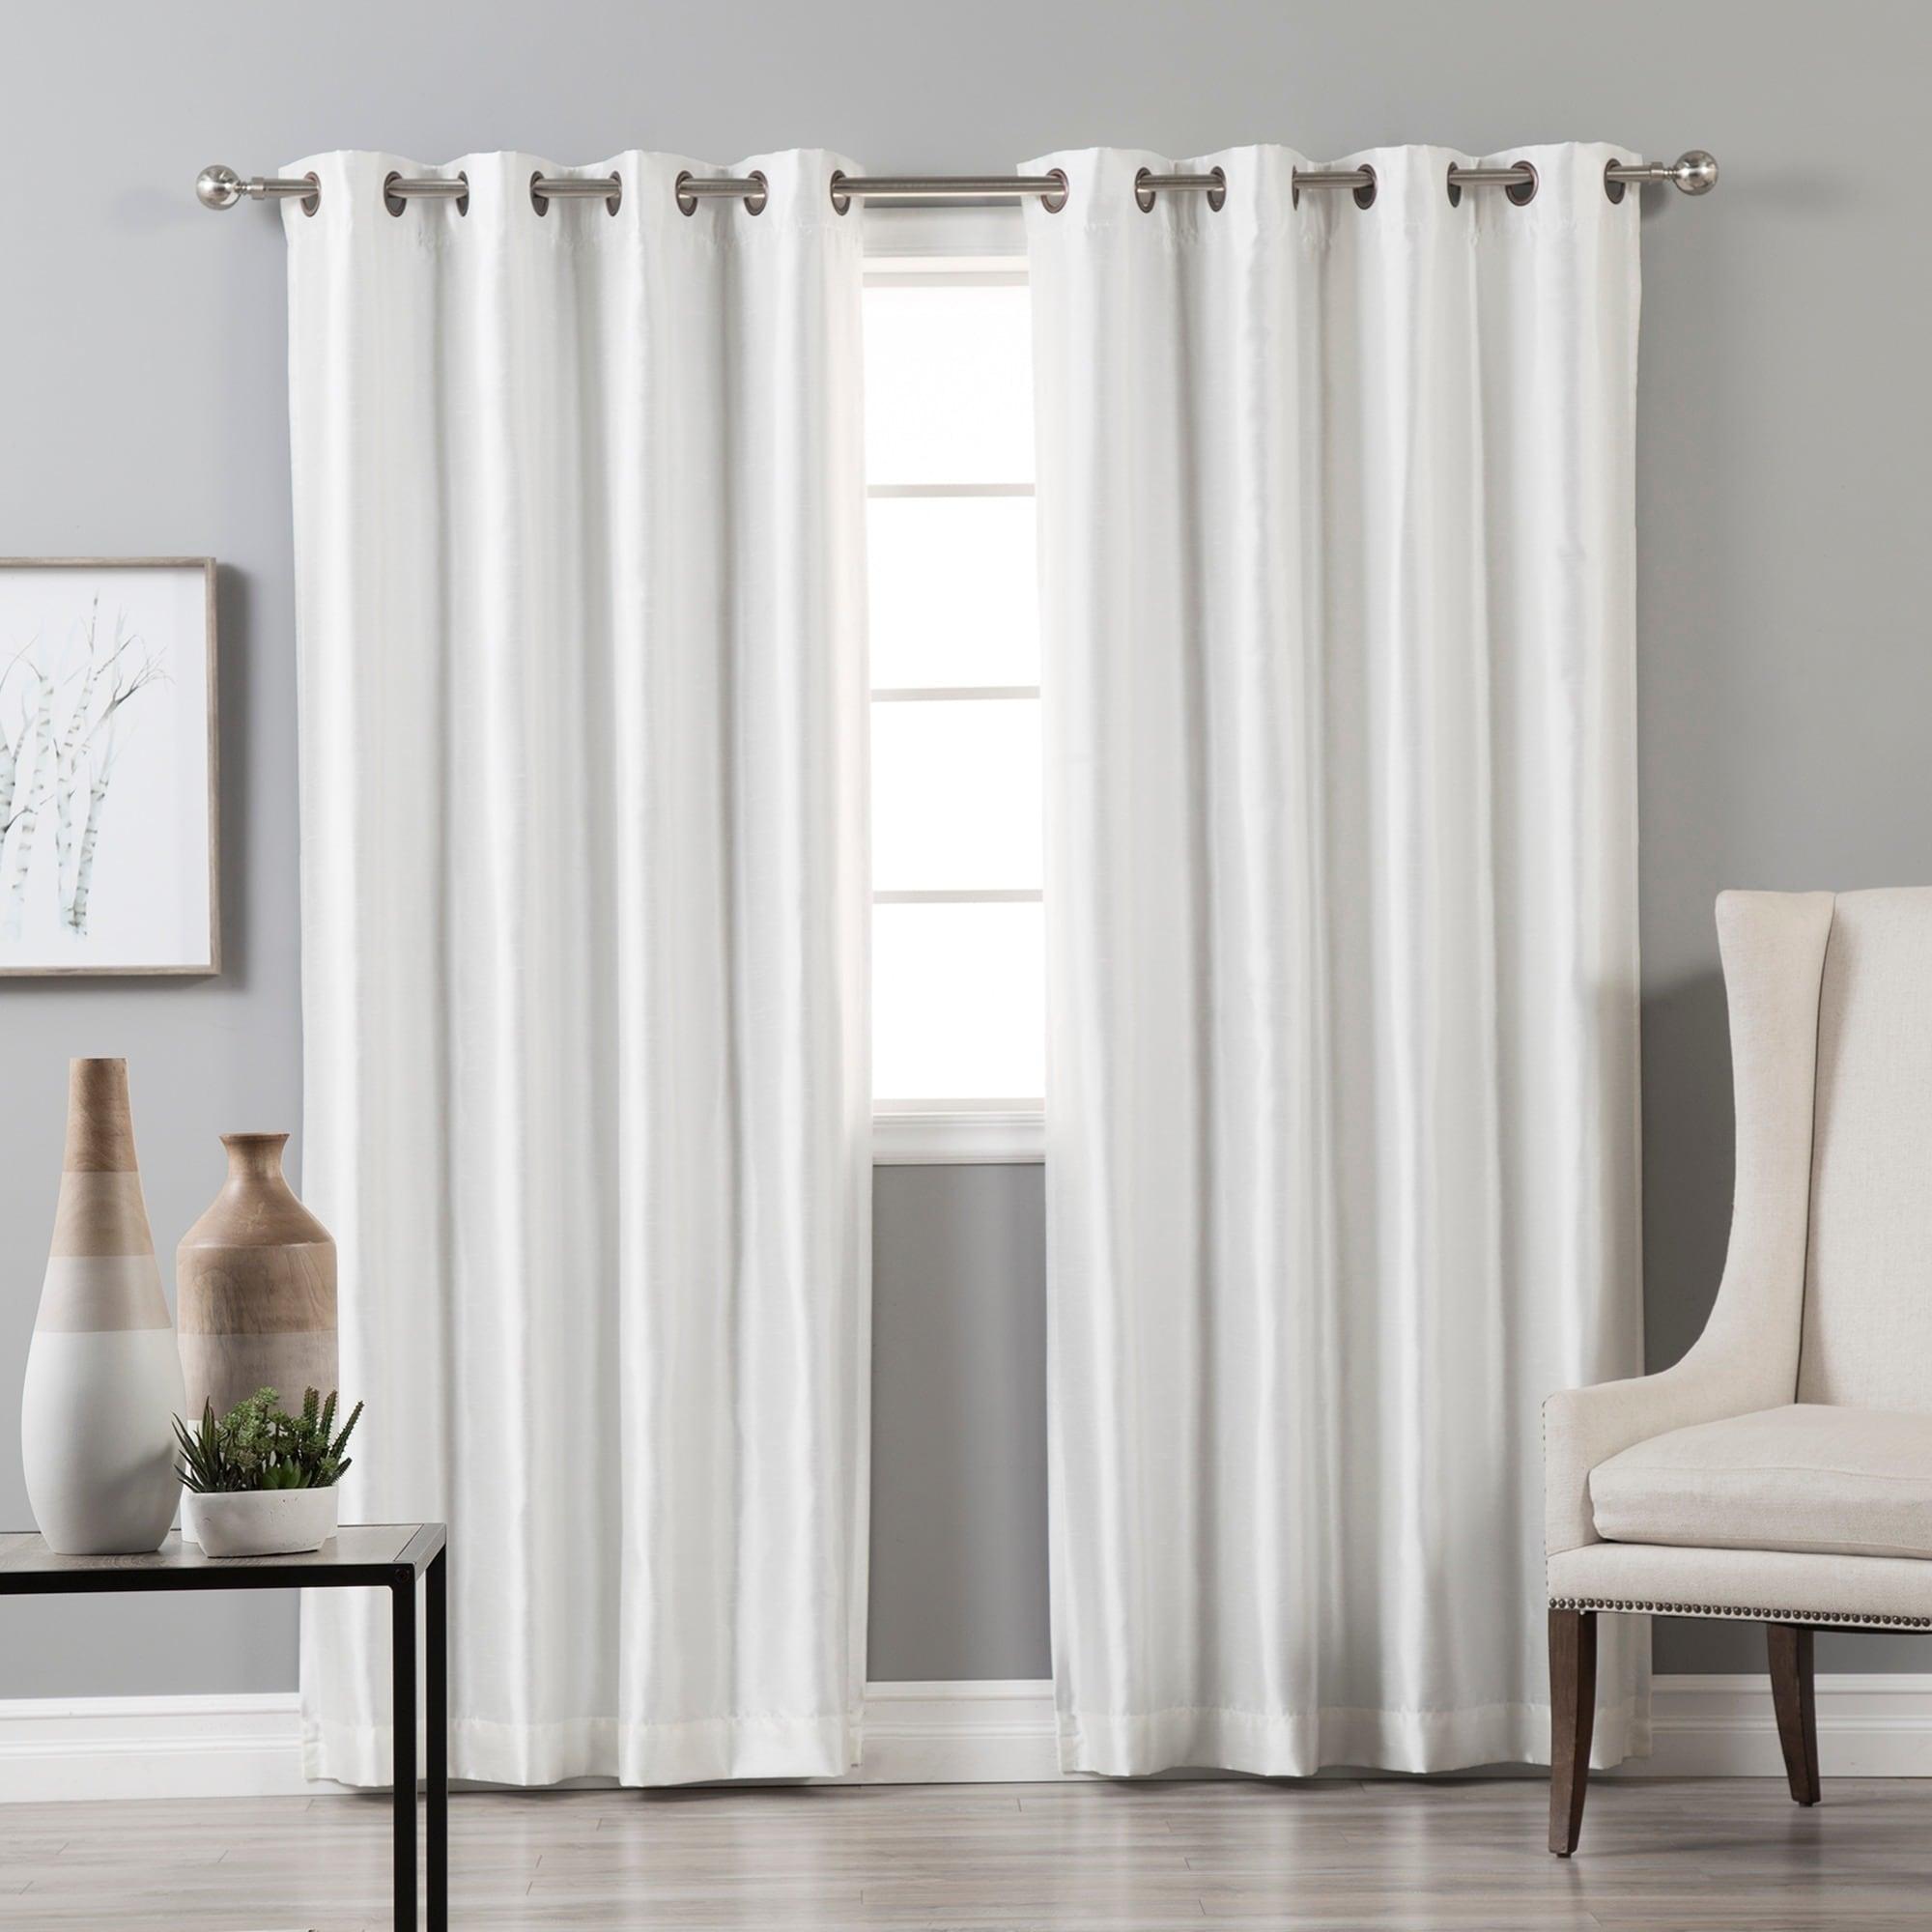 Aurora Home Grommet Top Faux Silk Blackout Curtain Panel Pair Overstock 8778398